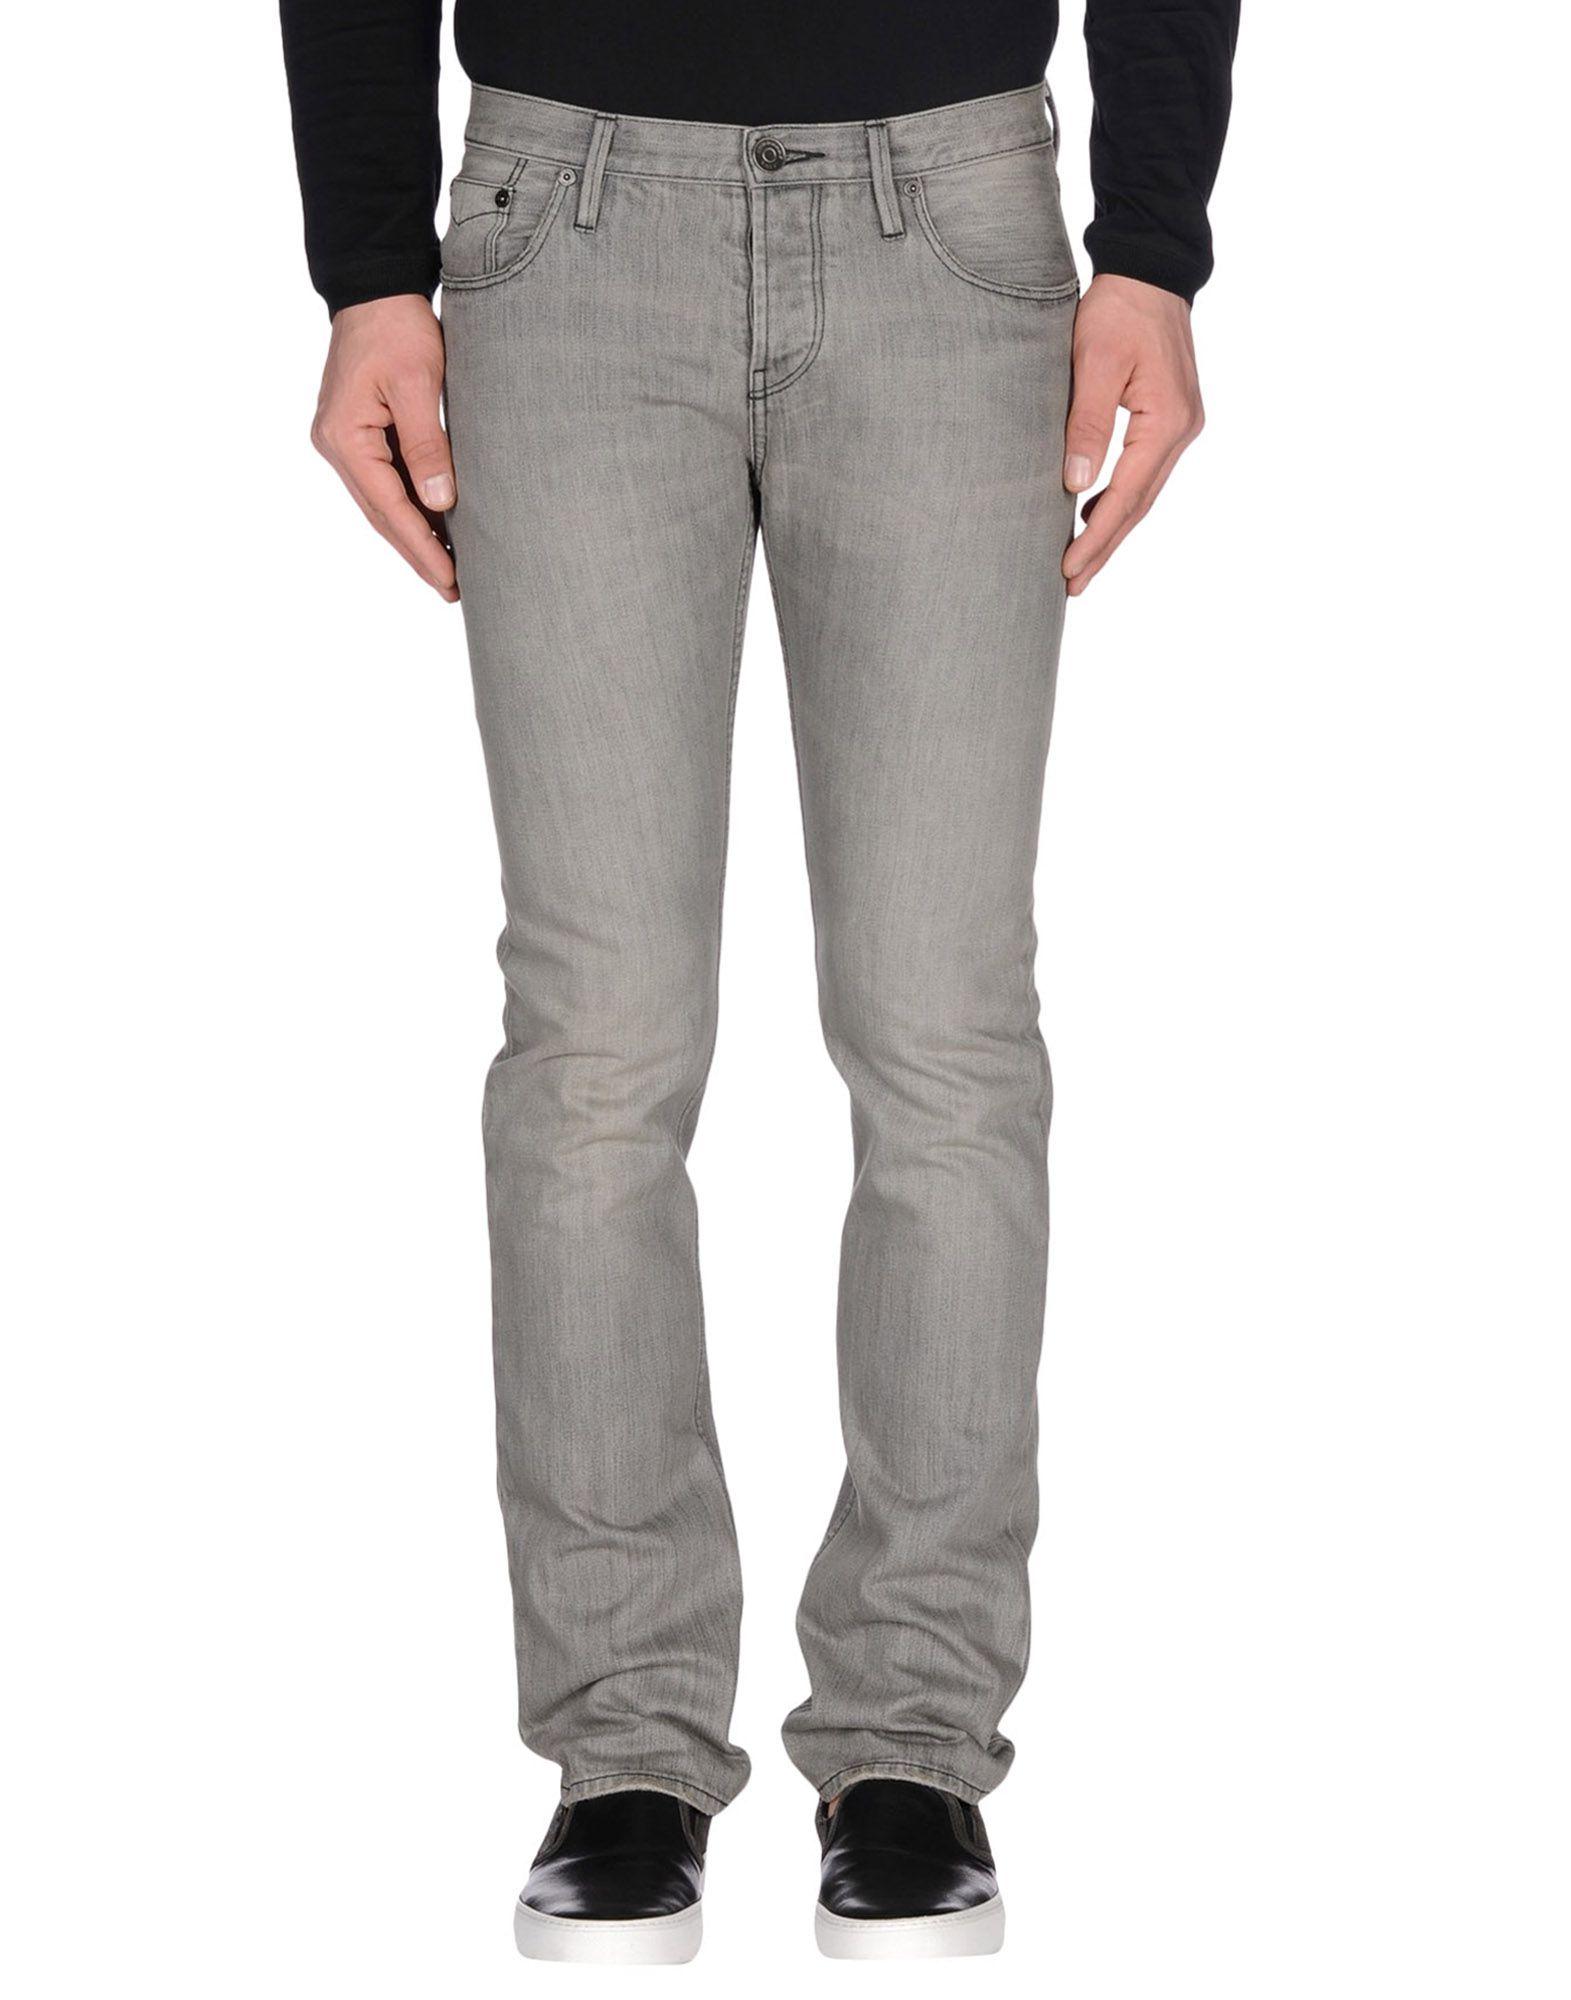 BURBERRY BRIT Jeans